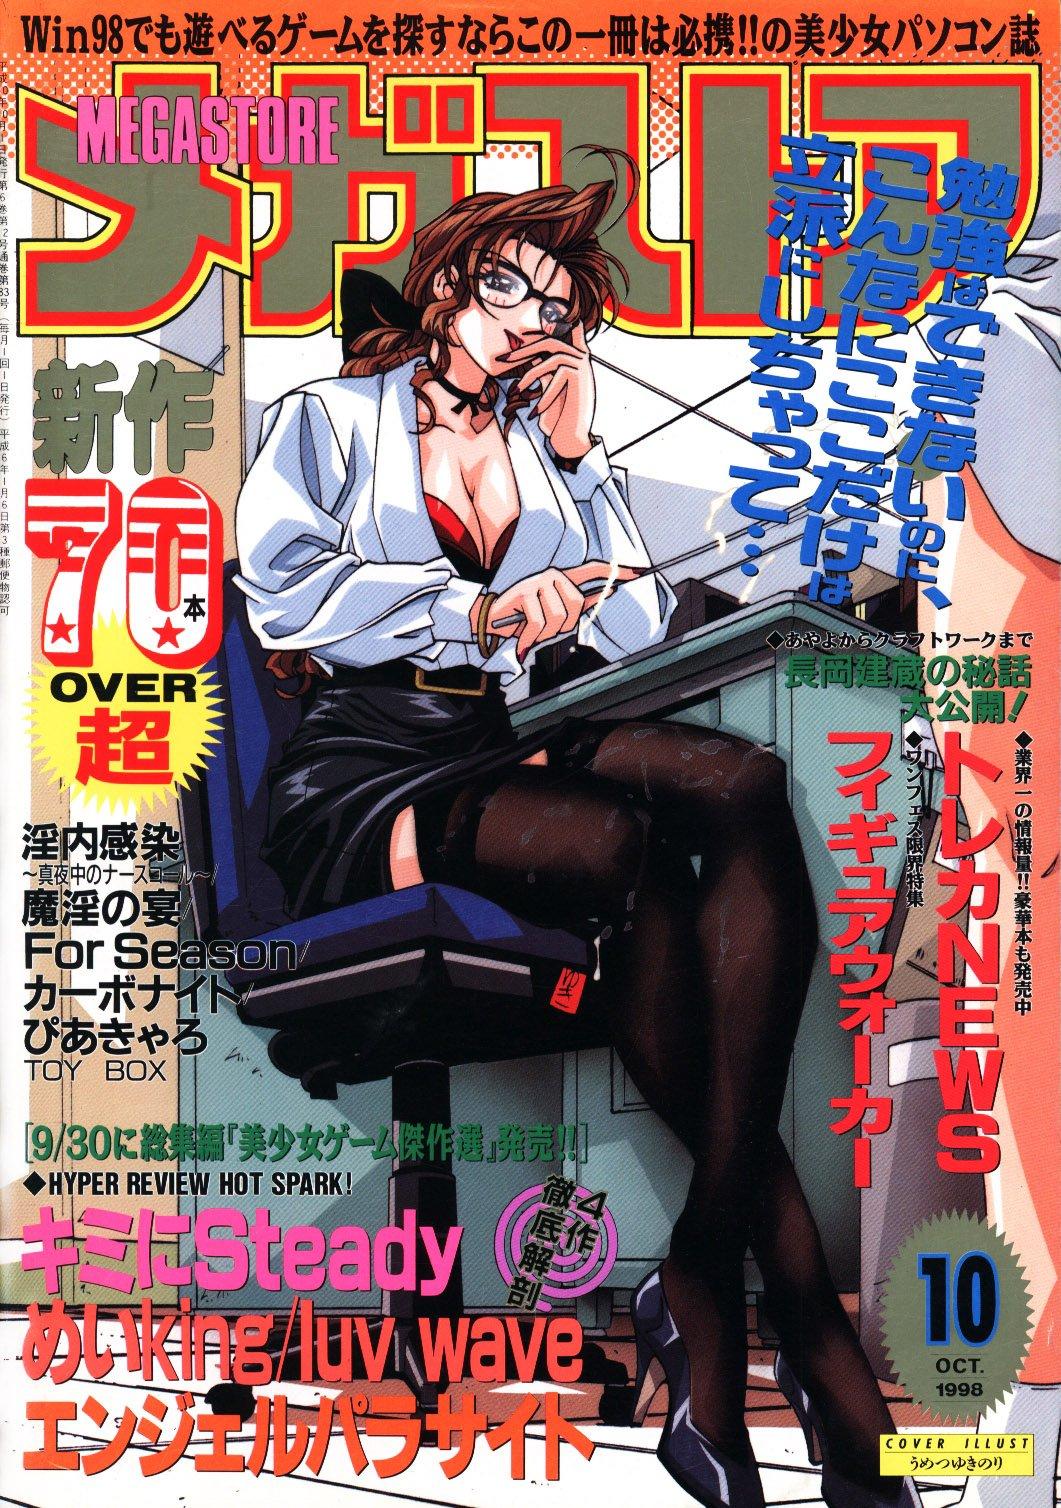 MegaStore 066 (October 1998)